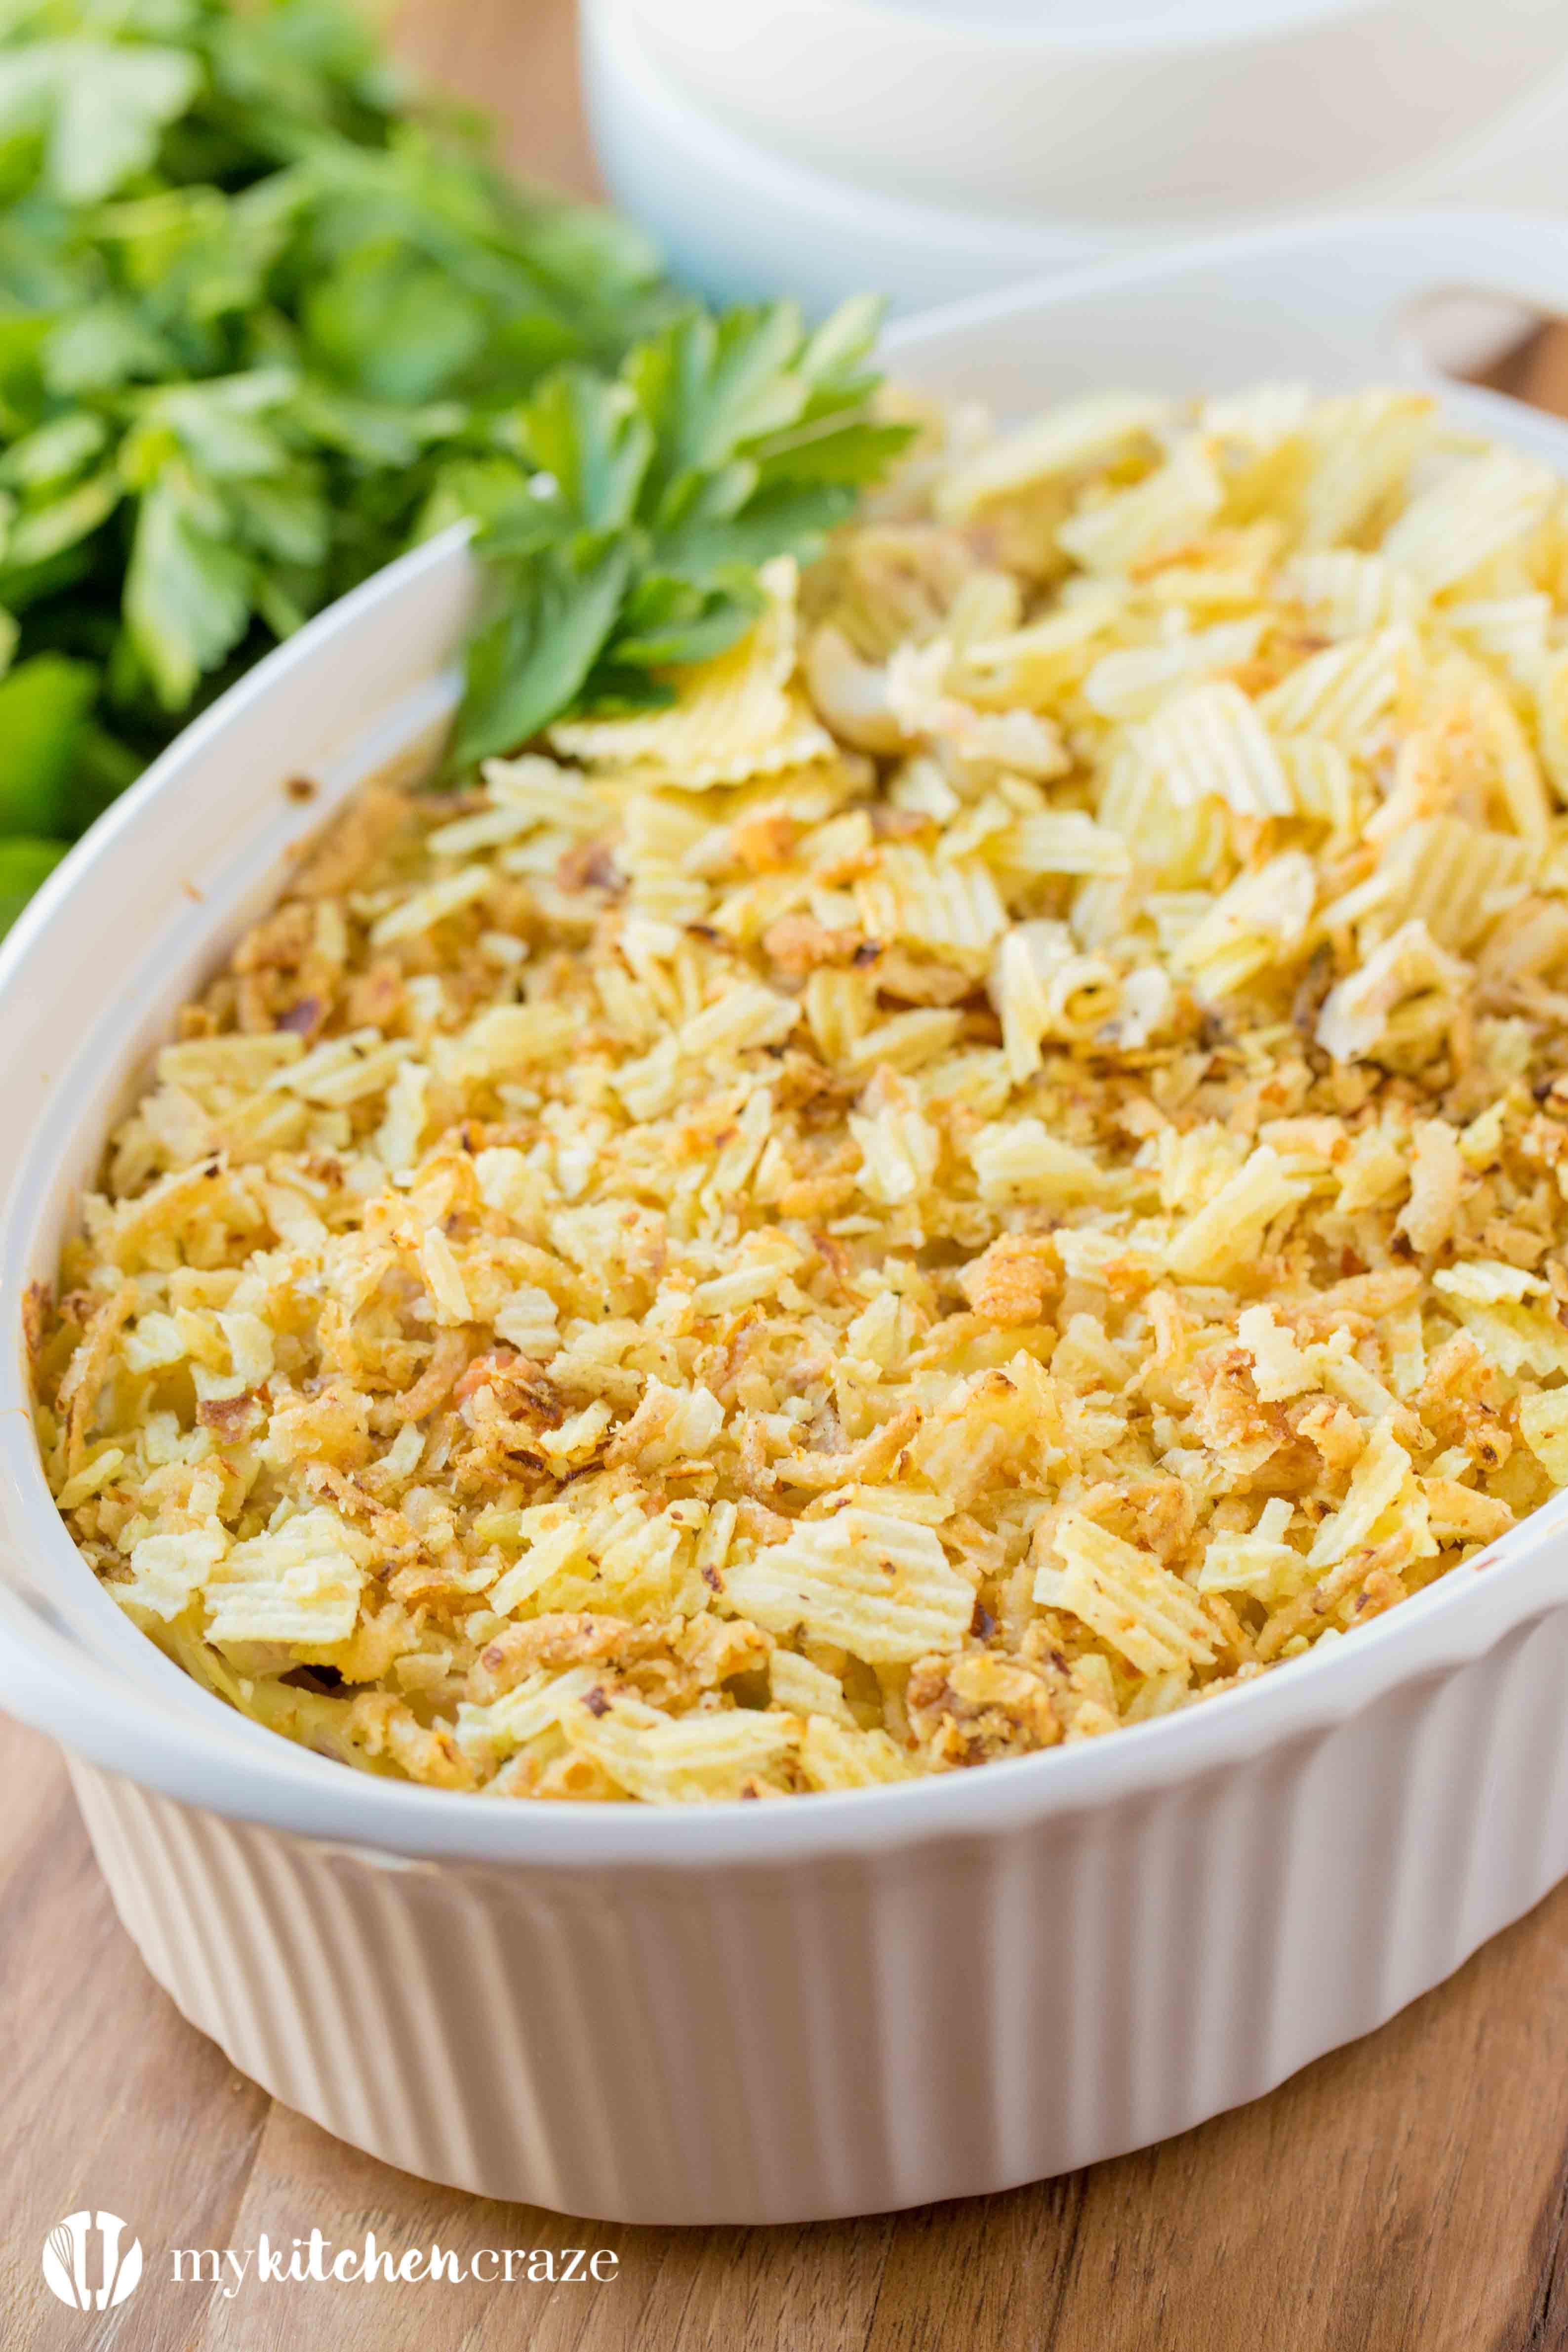 Tuna Casserole Easy  Tuna casserole easy recipes Food easy recipes